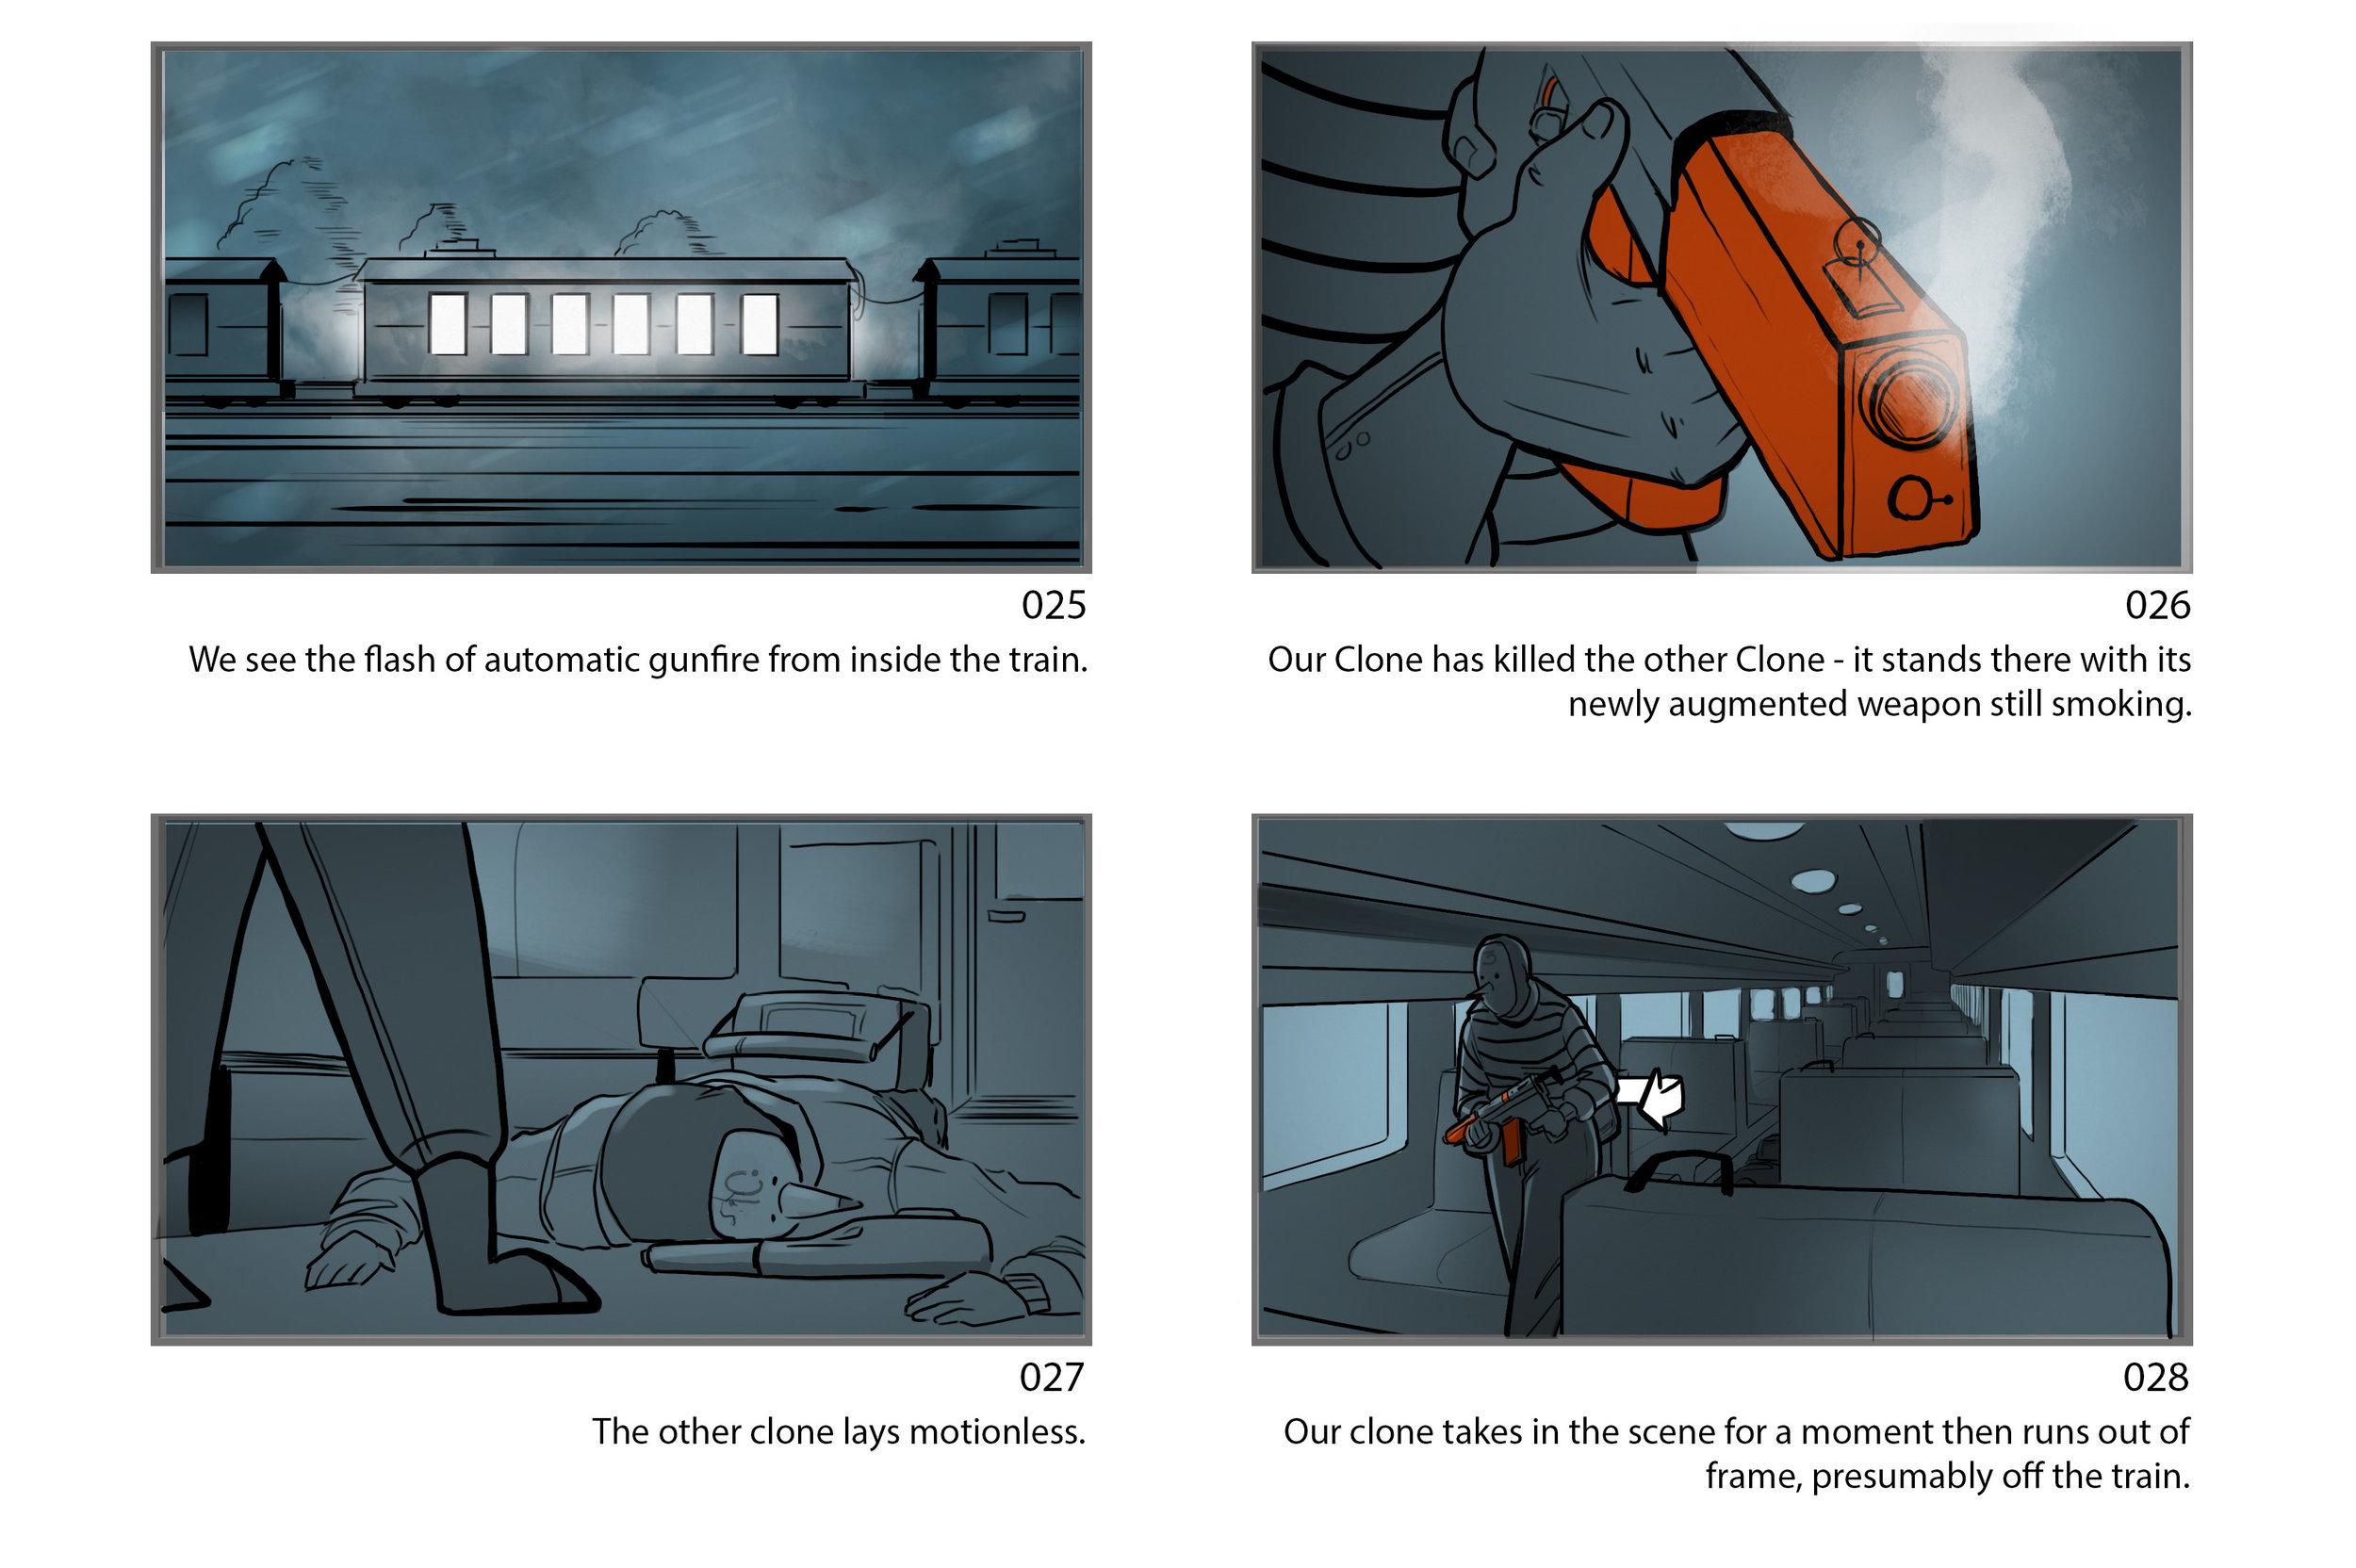 ASGHG_storyboards_0215-7.jpg